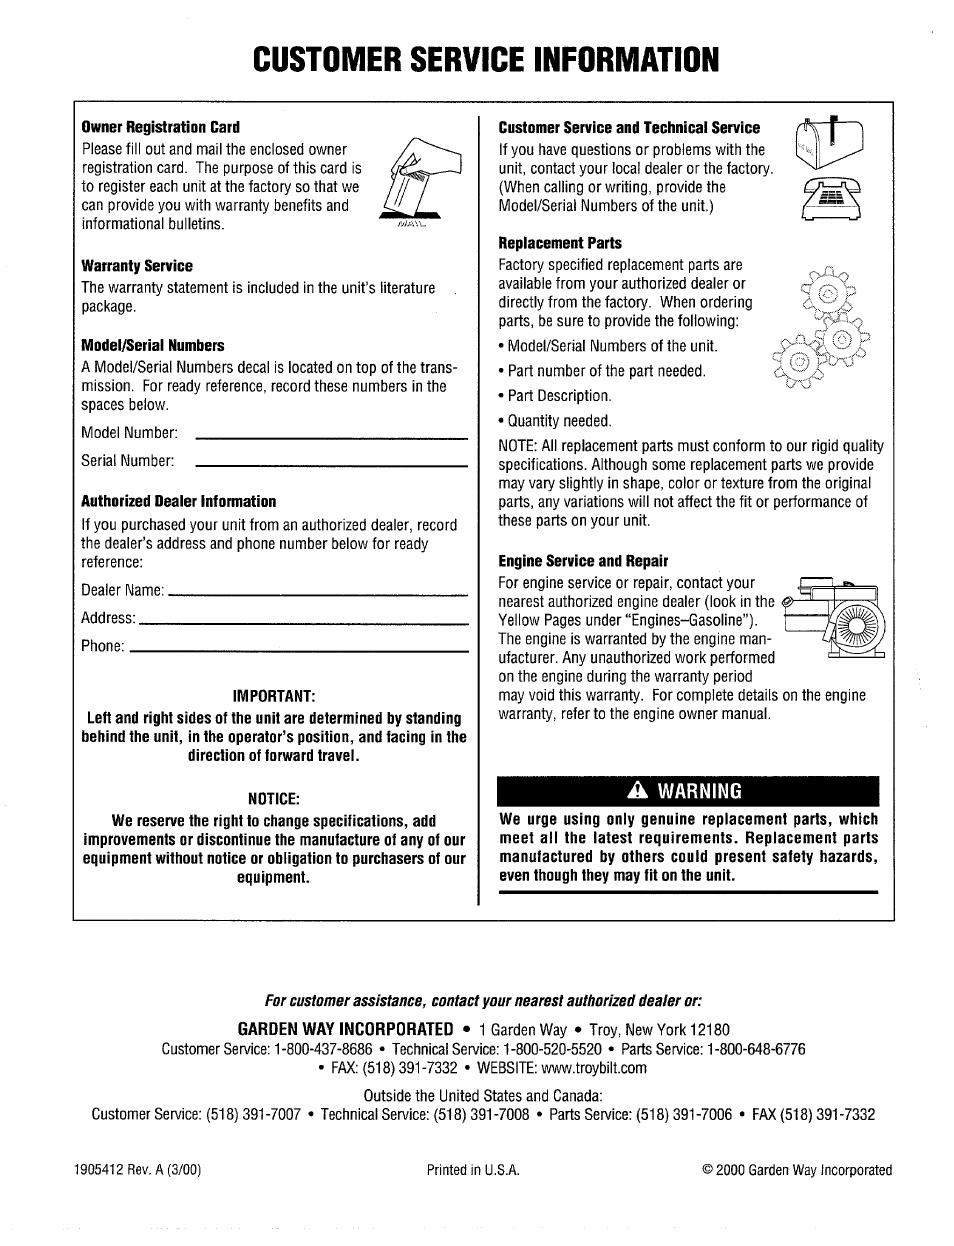 A warning, Customer service information | Troy-Bilt 12208